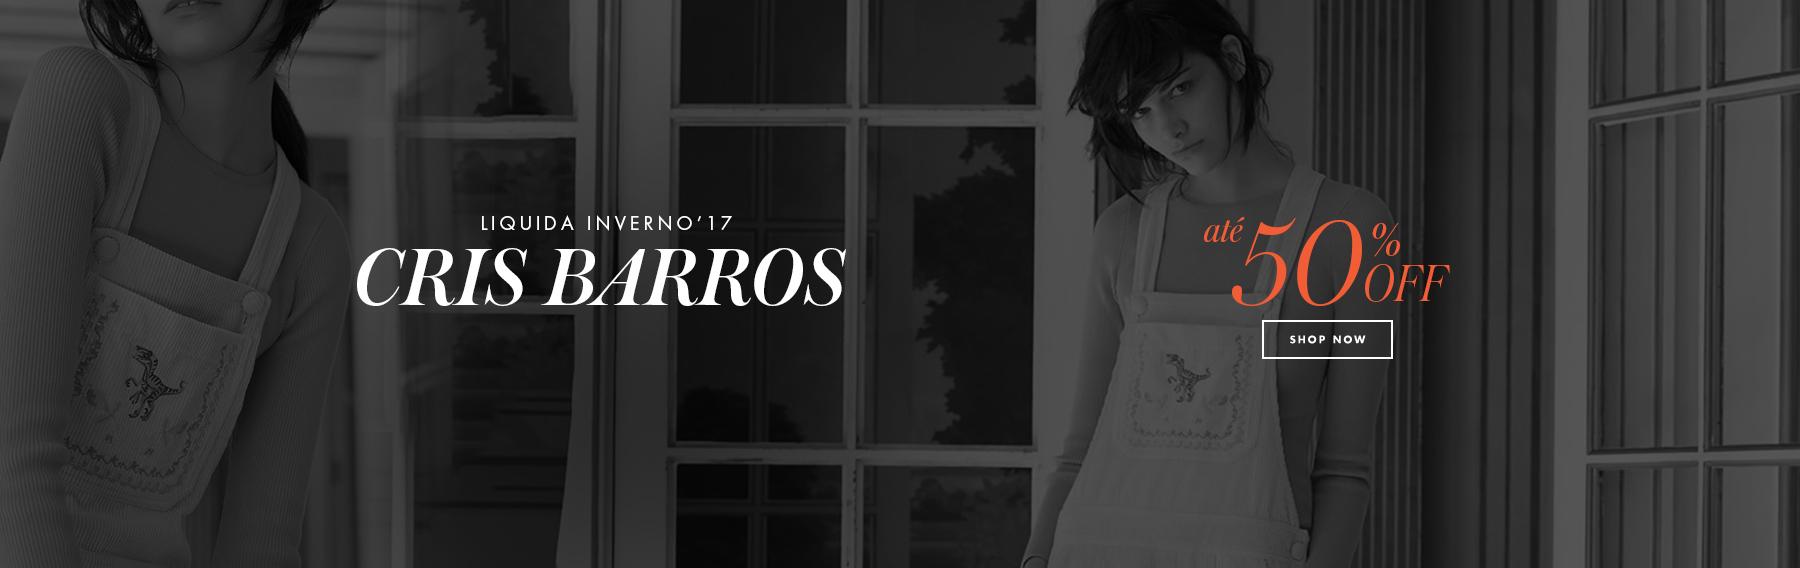 Cris Barros